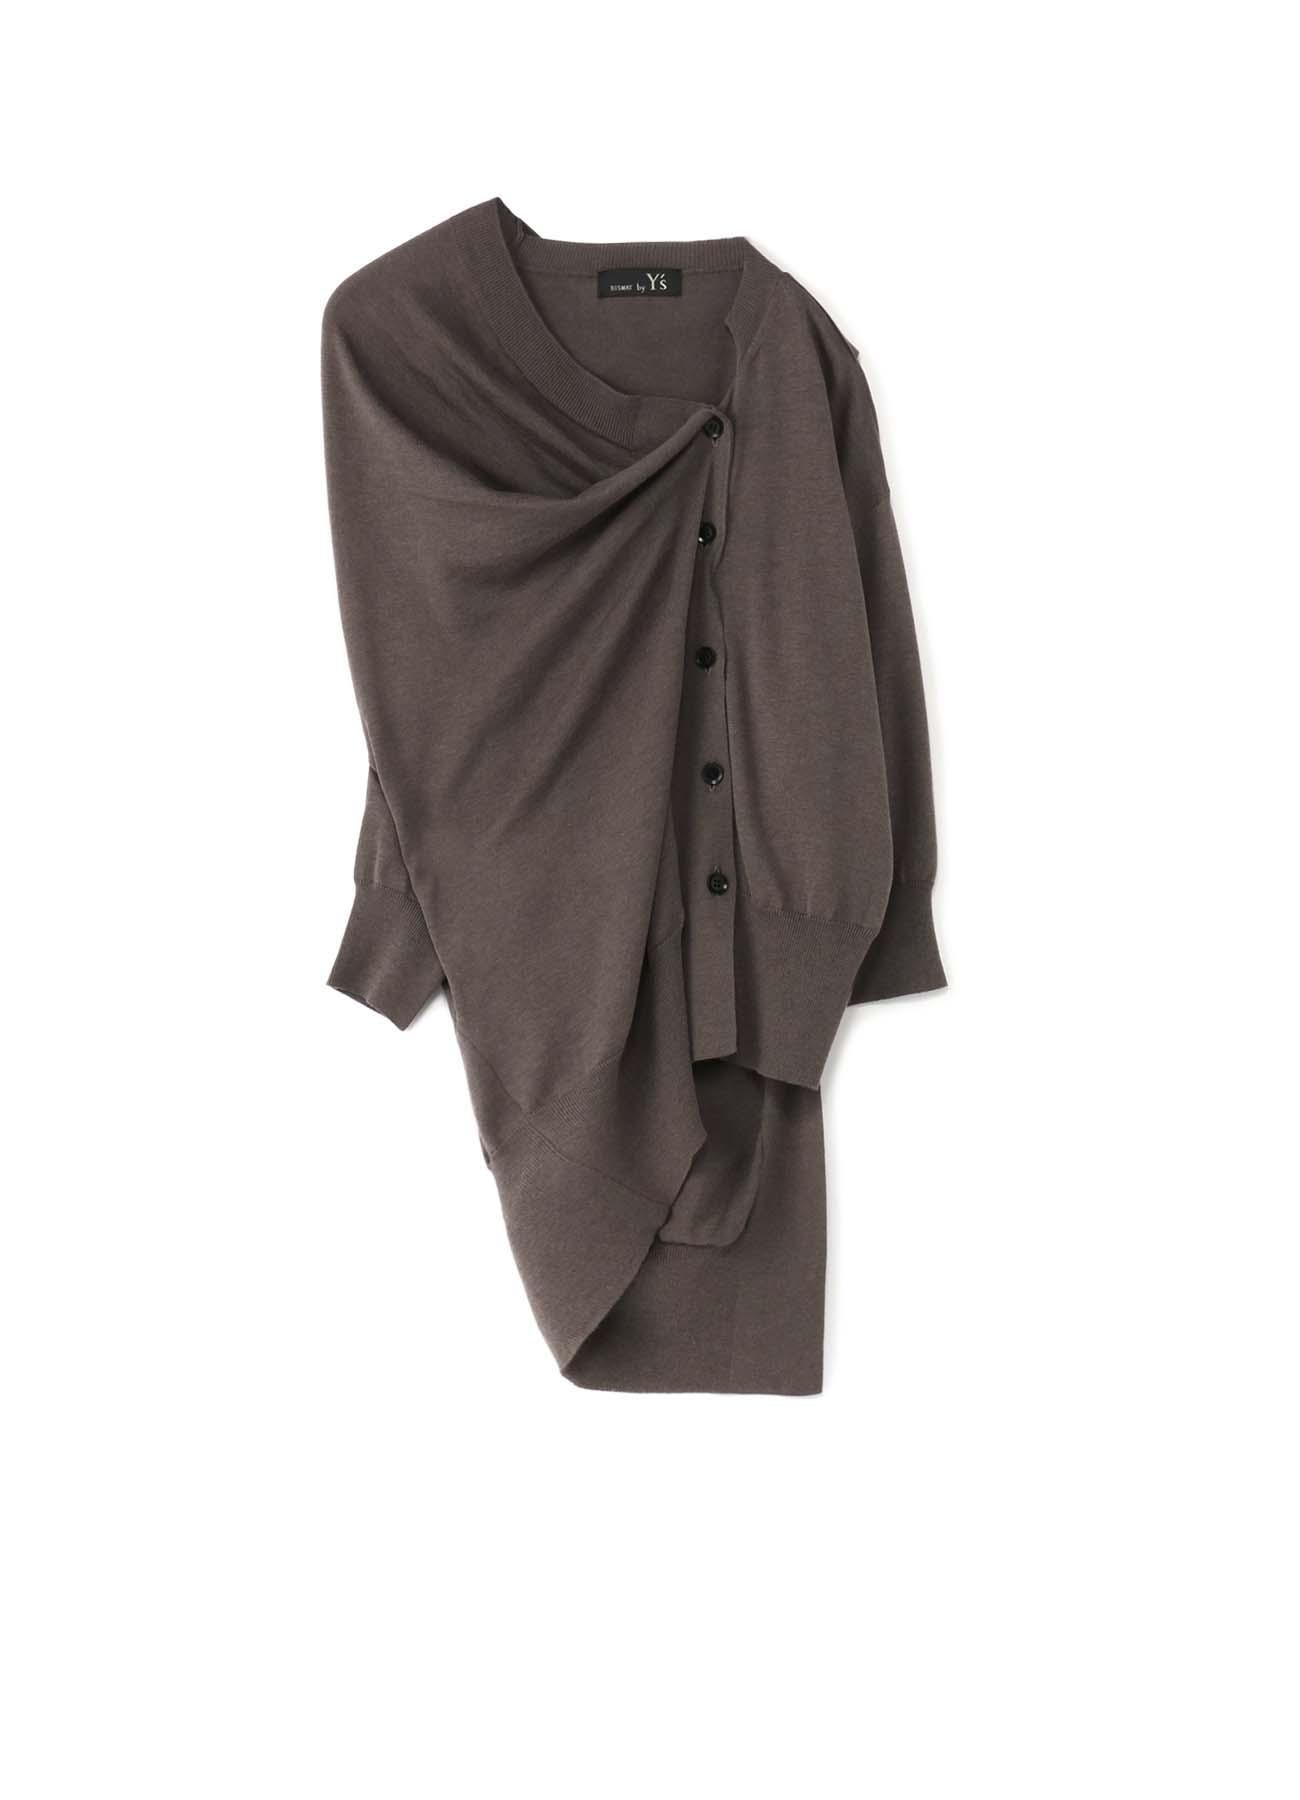 RISMATbyY的棉质天丝丝表披风变形短开衫